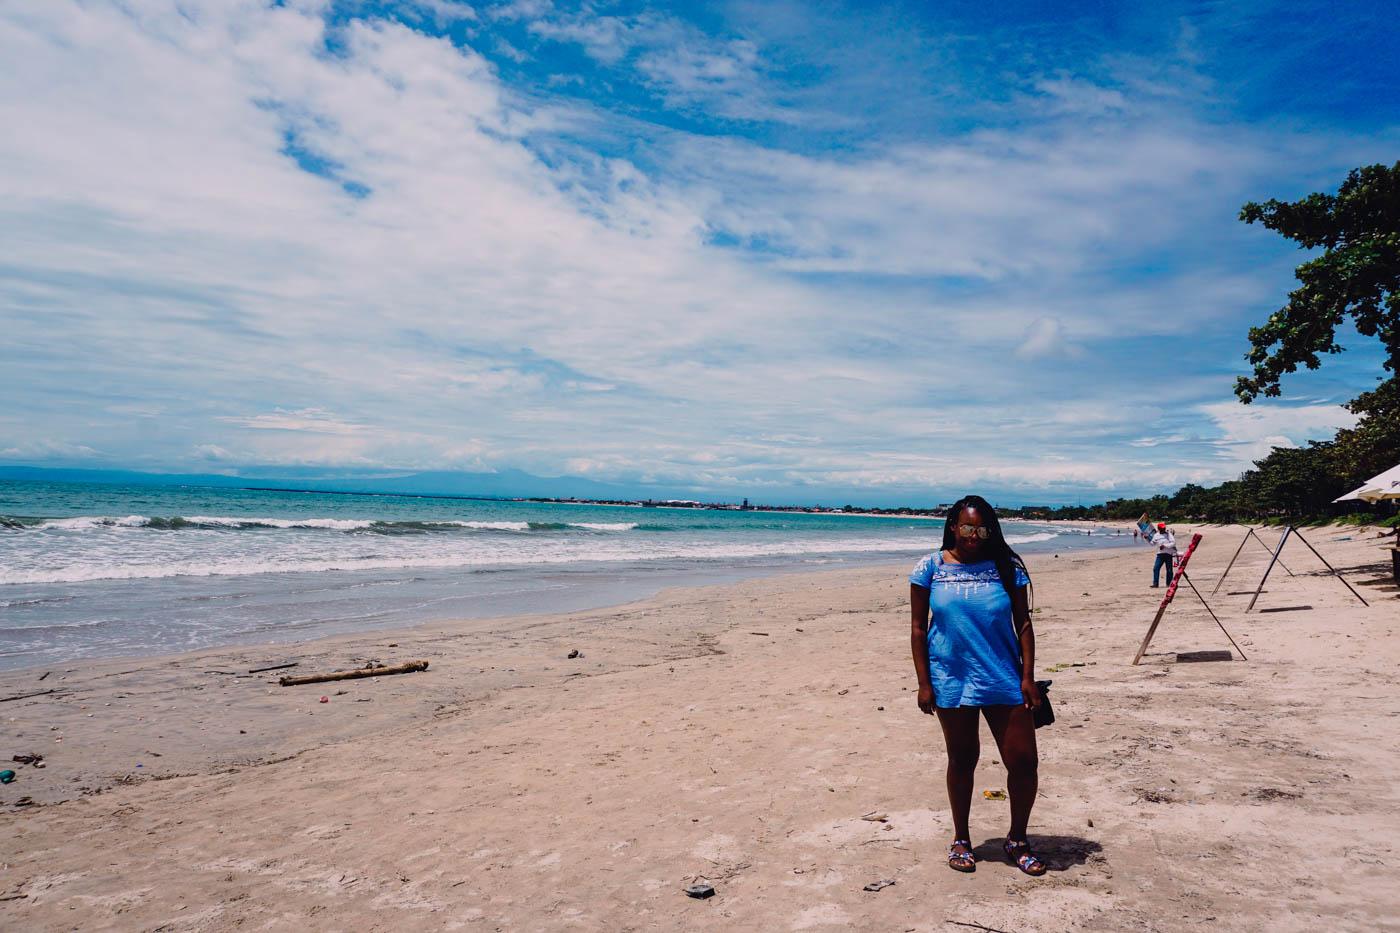 The Bali Guide I Bali Travel I Winter Sun I Indonesia I Travel #traveldestinations #traveltips #bali #indonesia